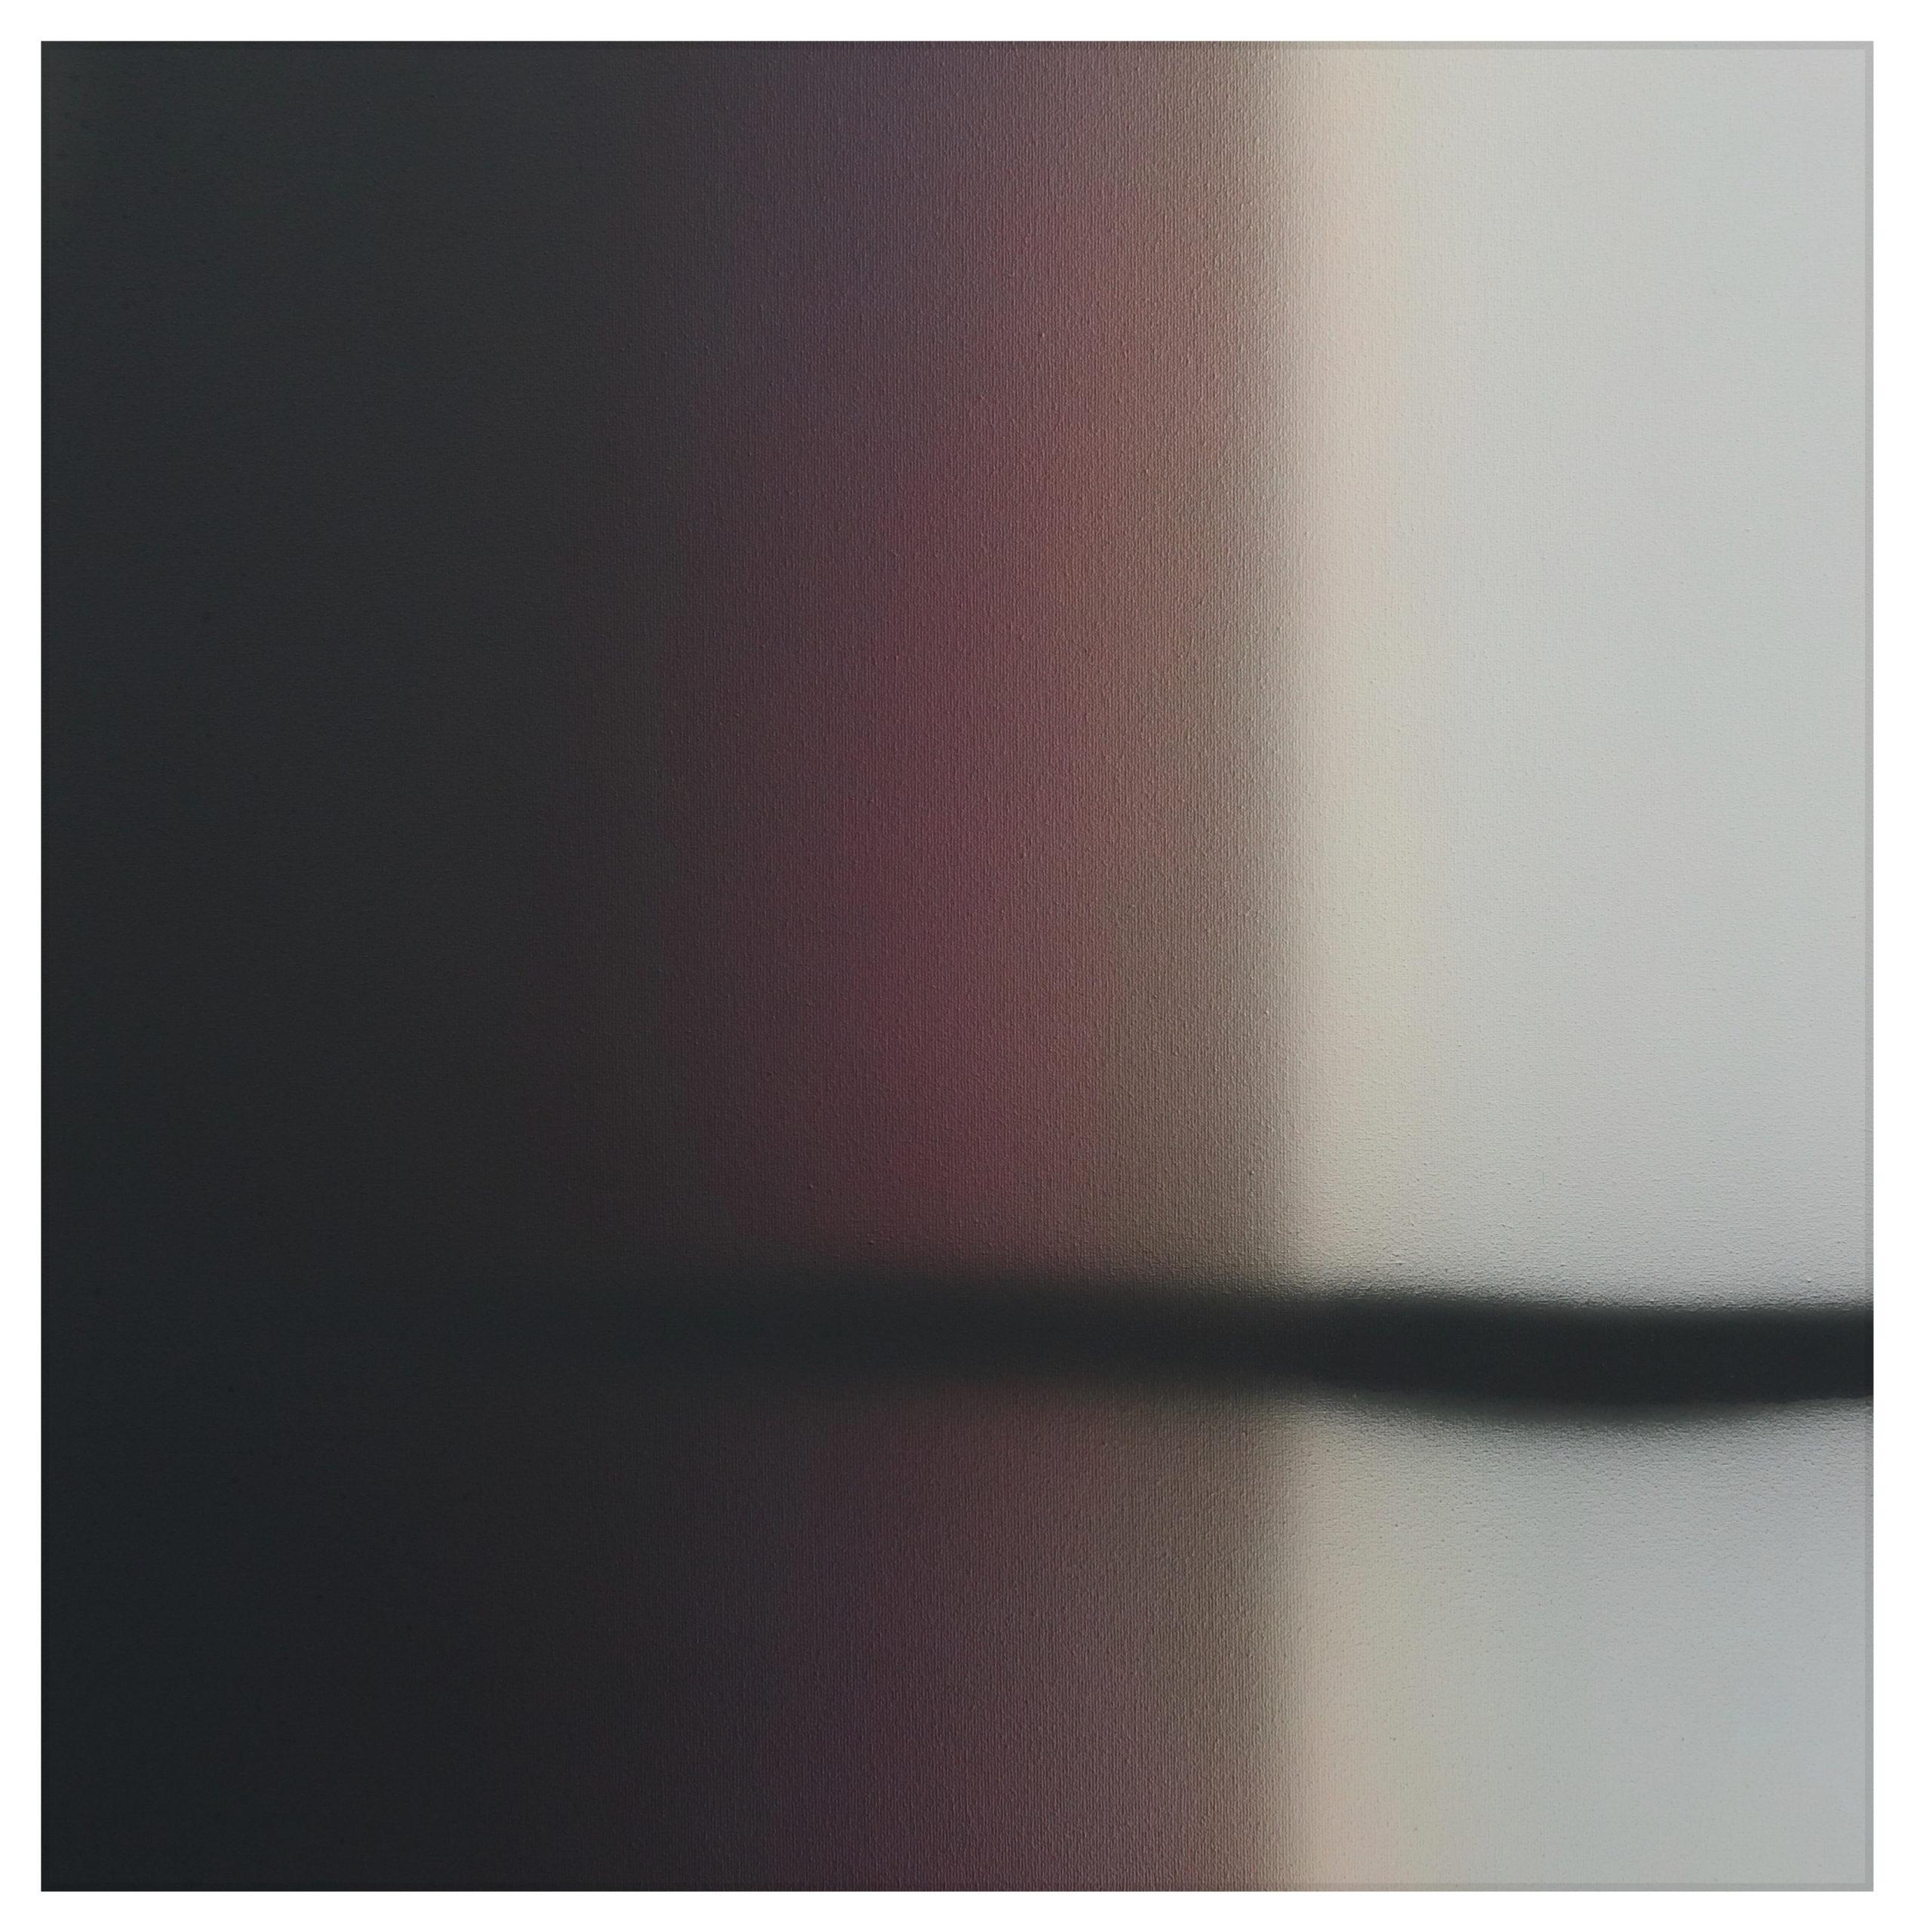 Nicolas Delprat, James, Fragmentation 4 acrylique sur toile 60×60 cm 2020 N°1, courtesy Nicolas Delprat